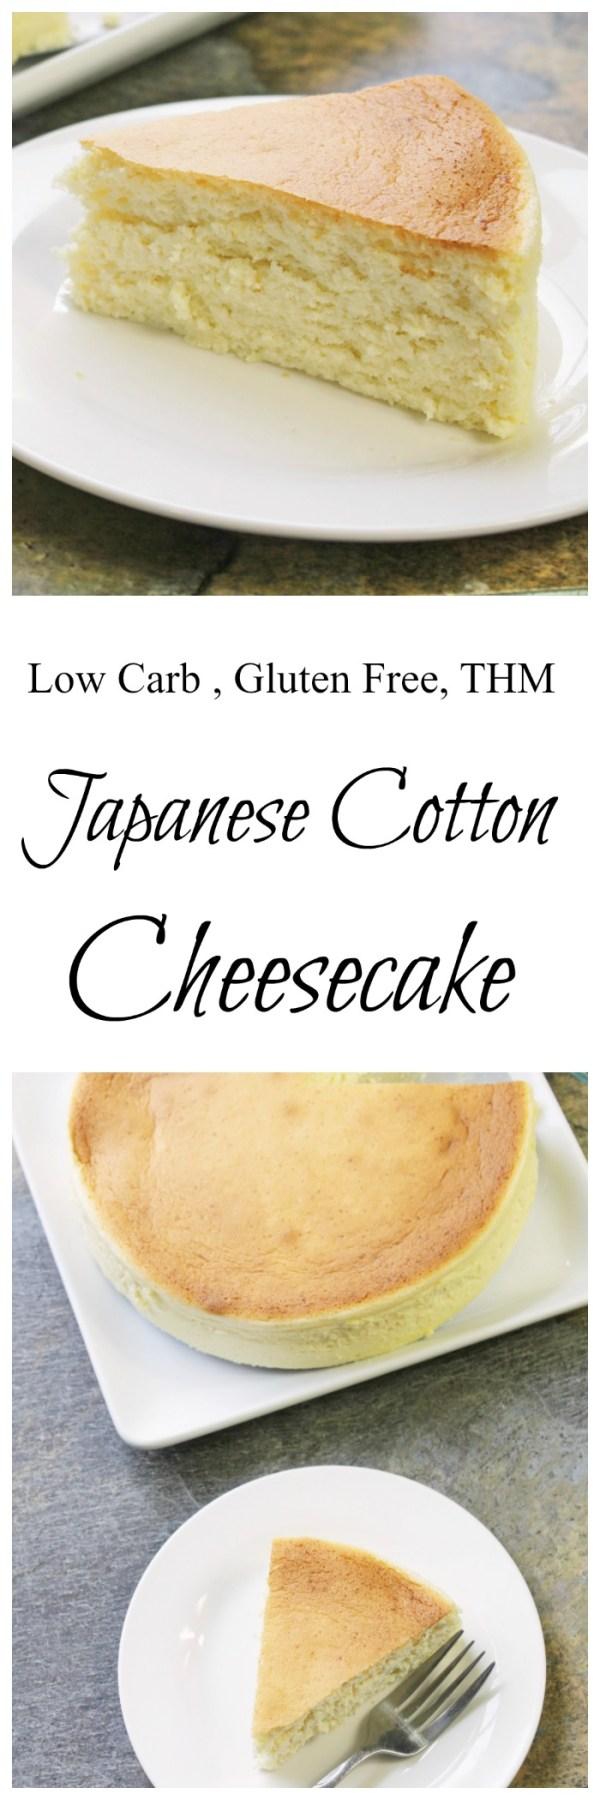 "Japanese ""Cotton"" Cheesecake || Low Carb, Sugar Free, THM, Gluten Free, Keto"